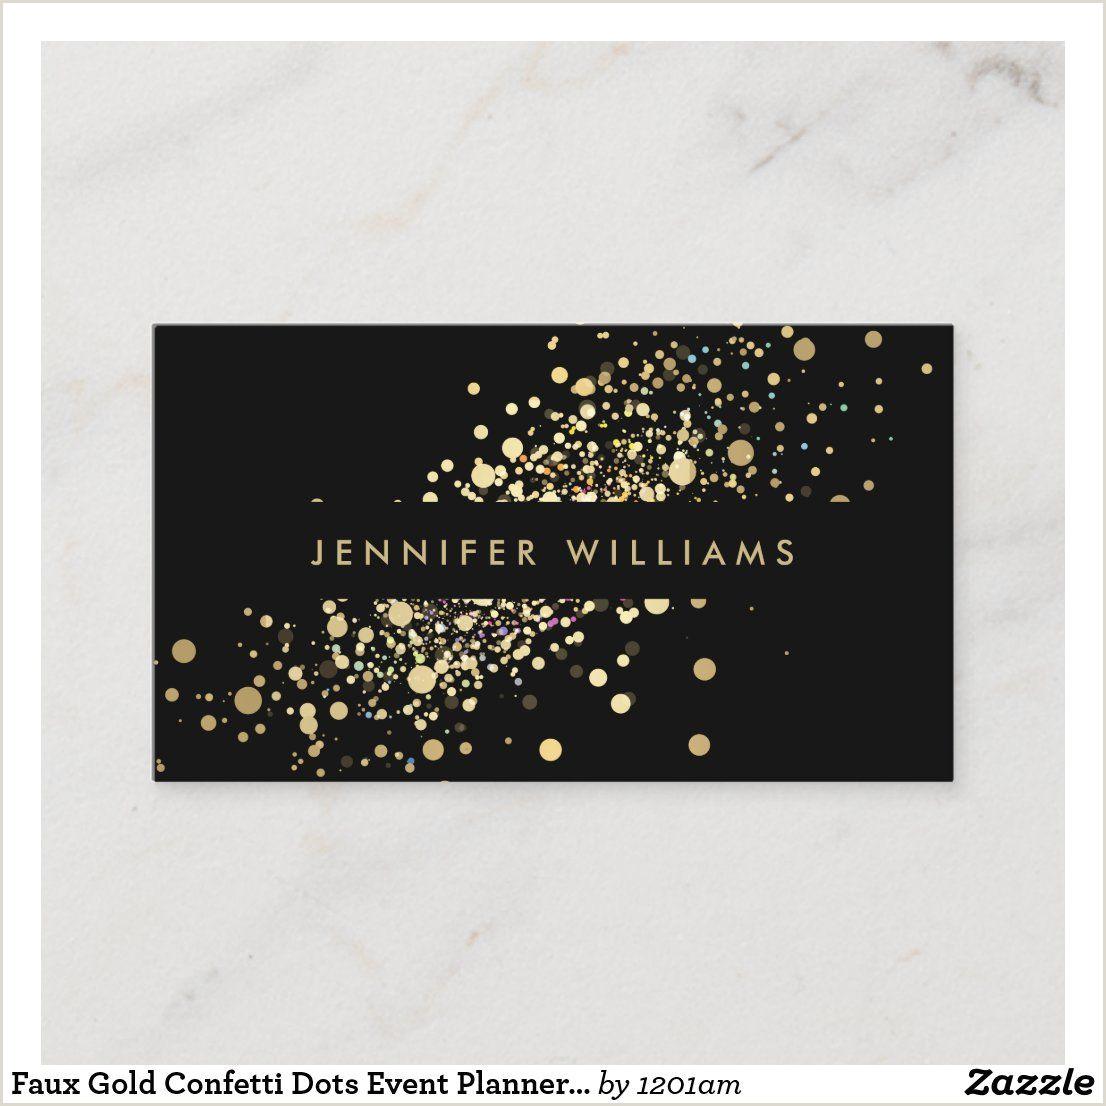 Unique Sparkly Business Cards Faux Gold Confetti Dots Event Planner Stylist Business Card